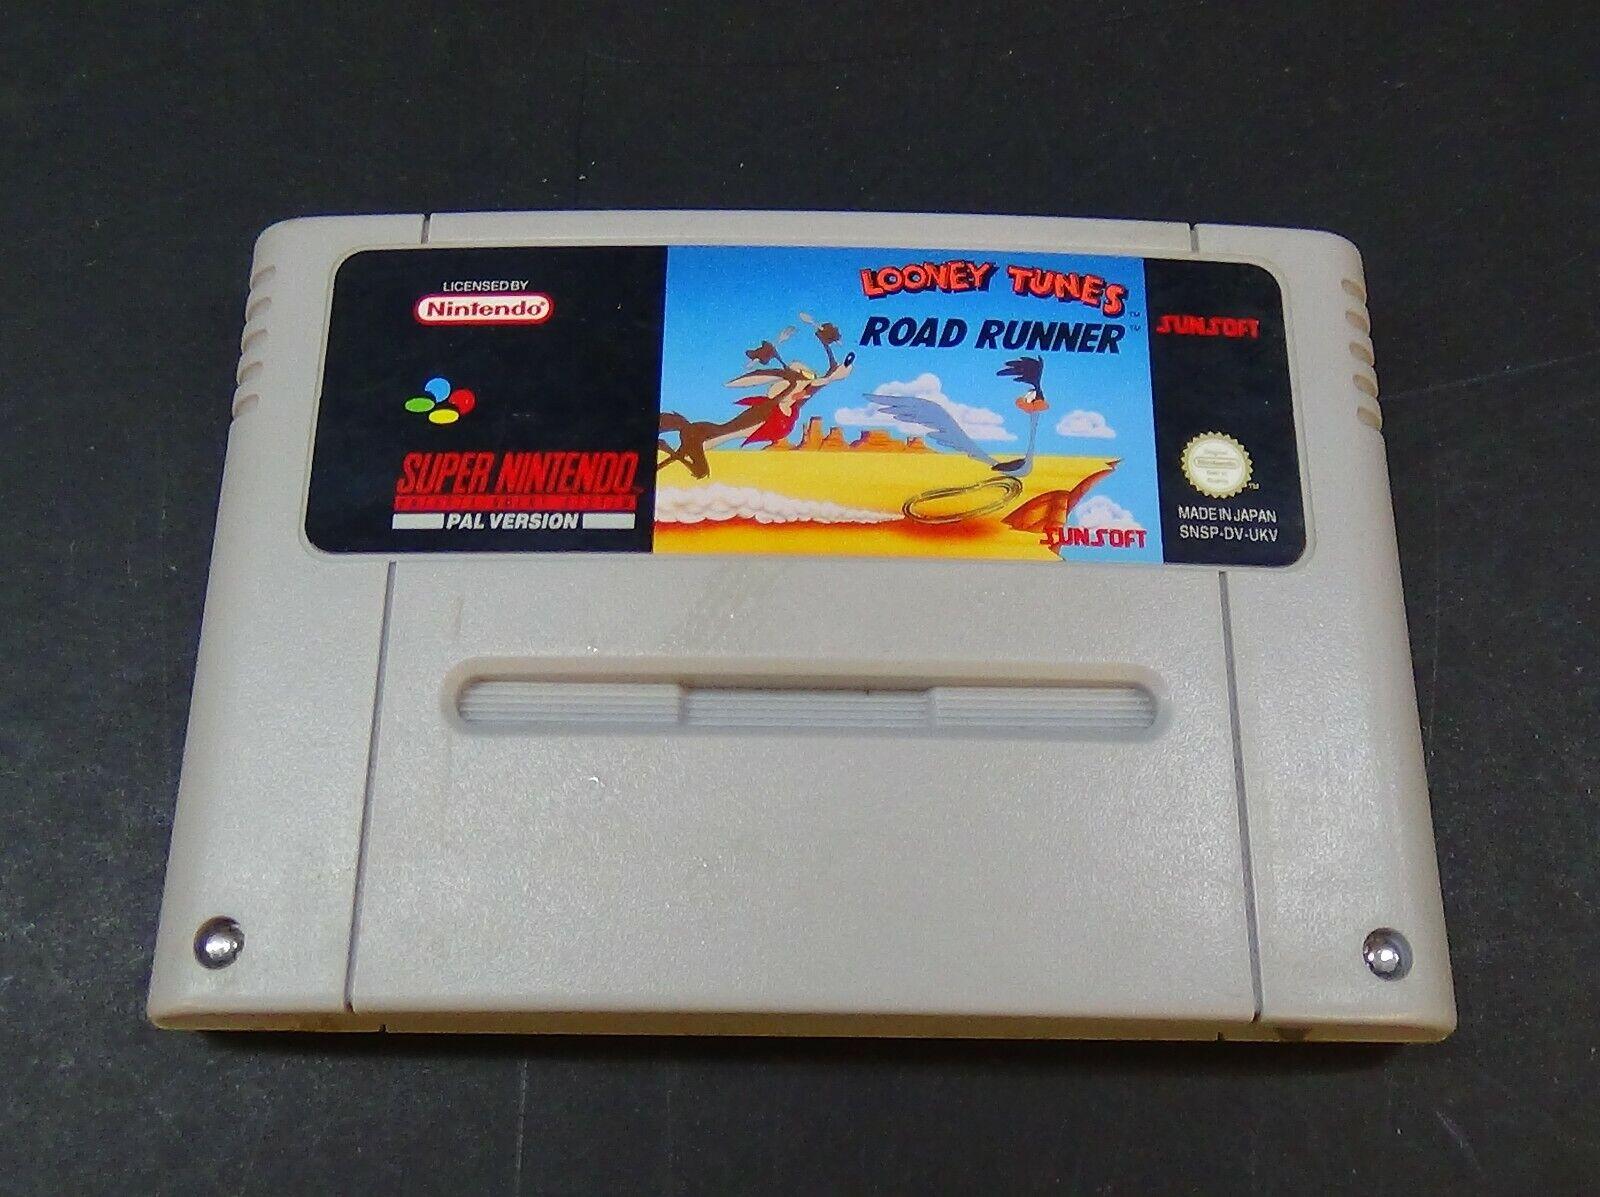 Road Runner - Super Nintendo (SNES) PAL - Cartridge Only